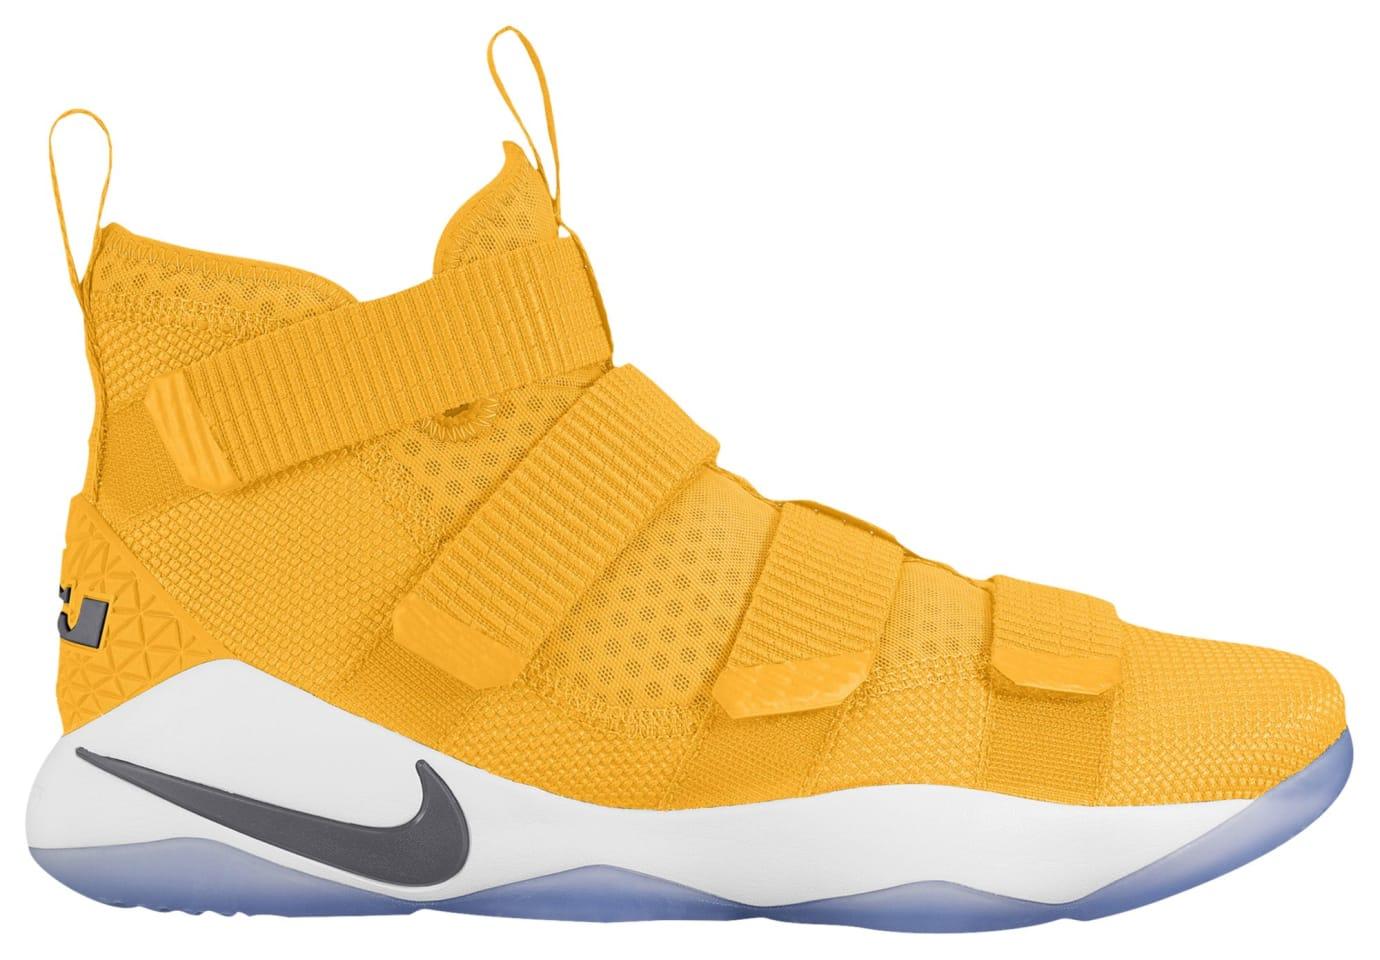 Nike LeBron Soldier 11 TB Yellow